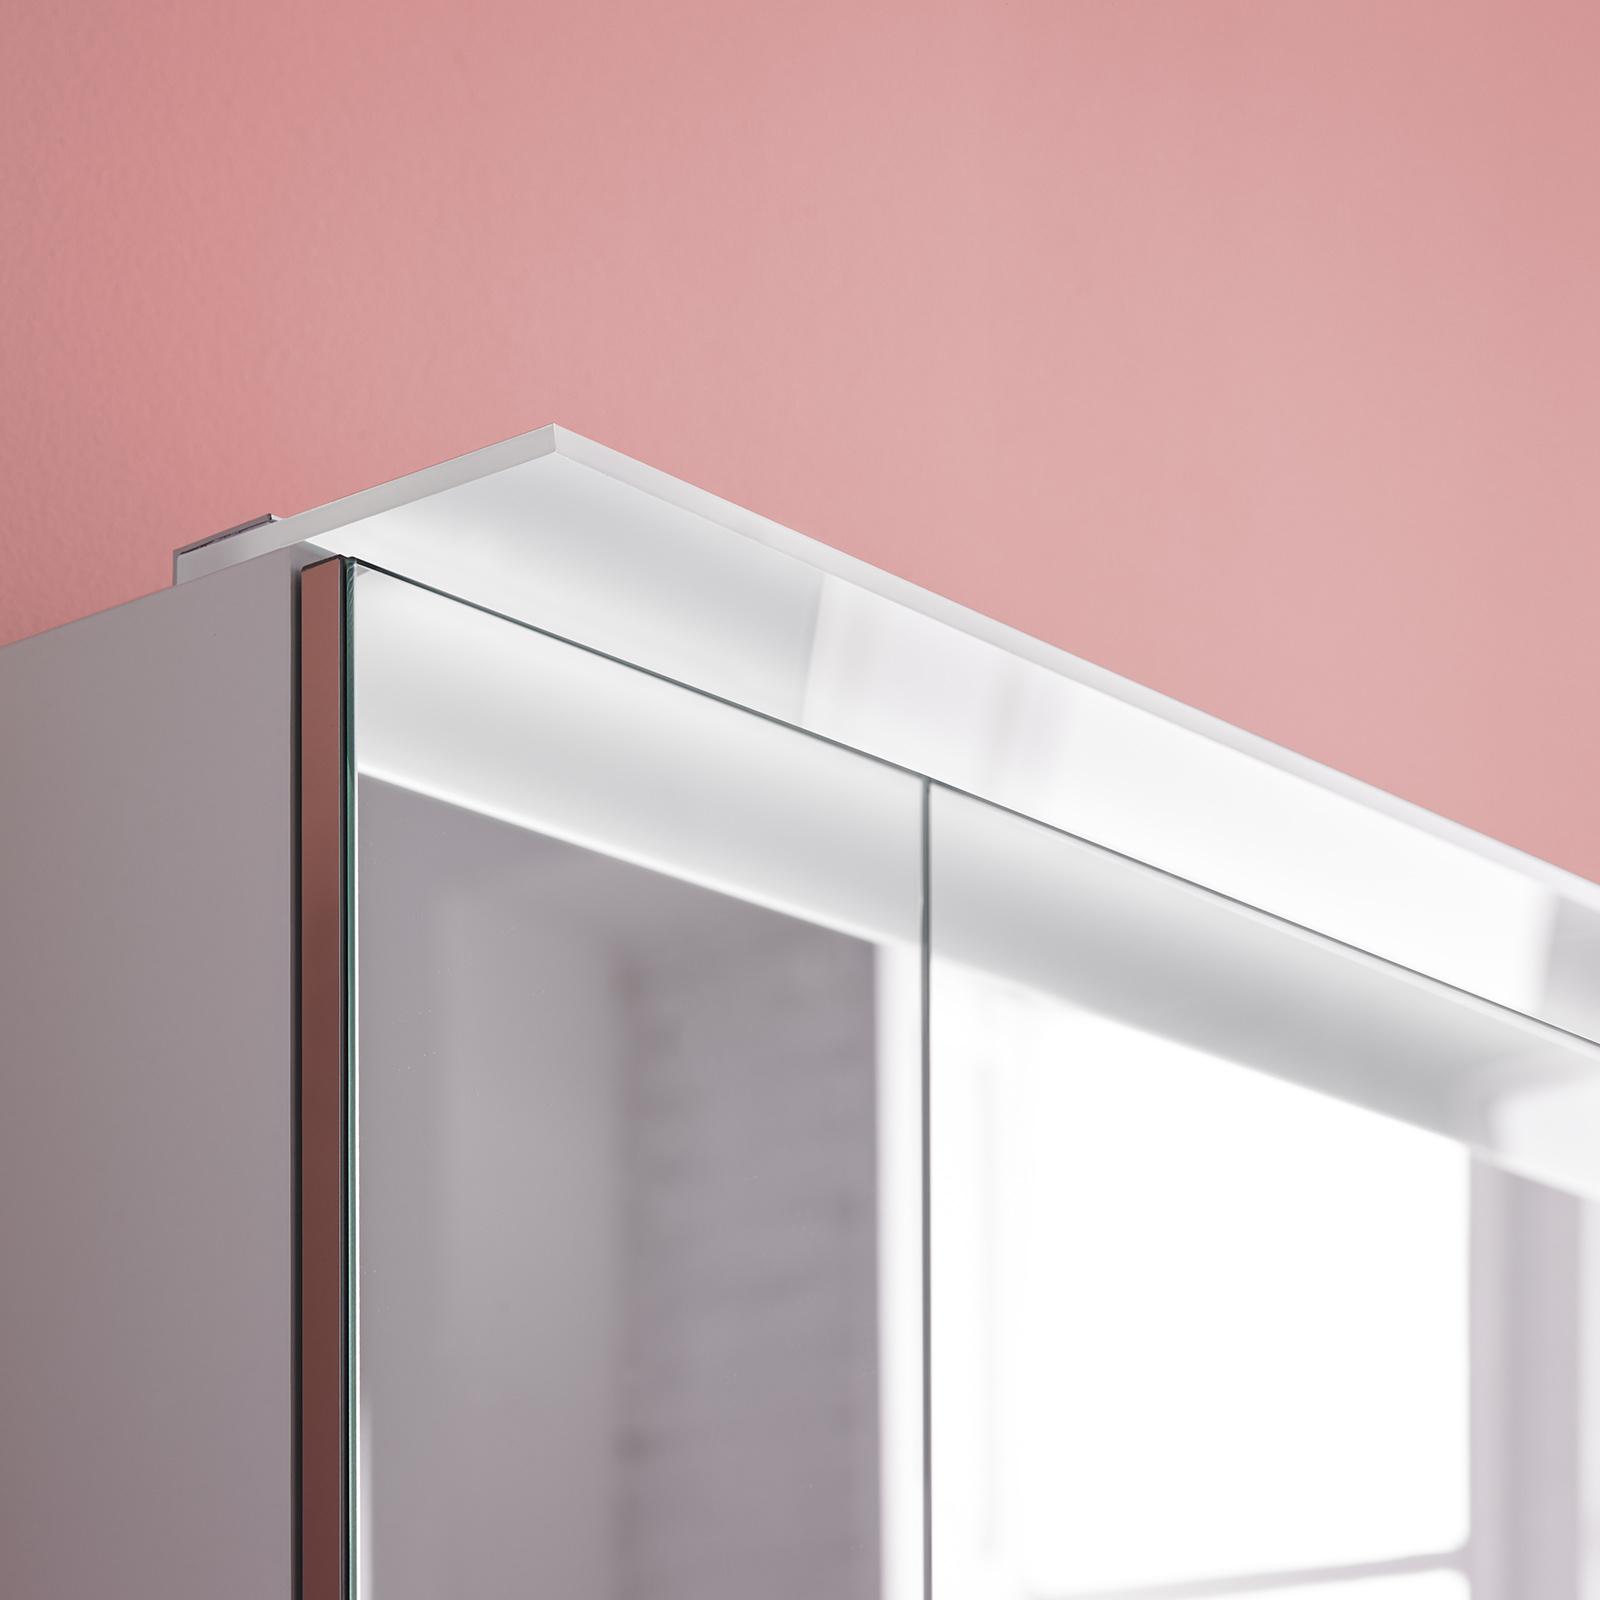 LED-Möbelaufbauleuchte Adele, Breite 100 cm